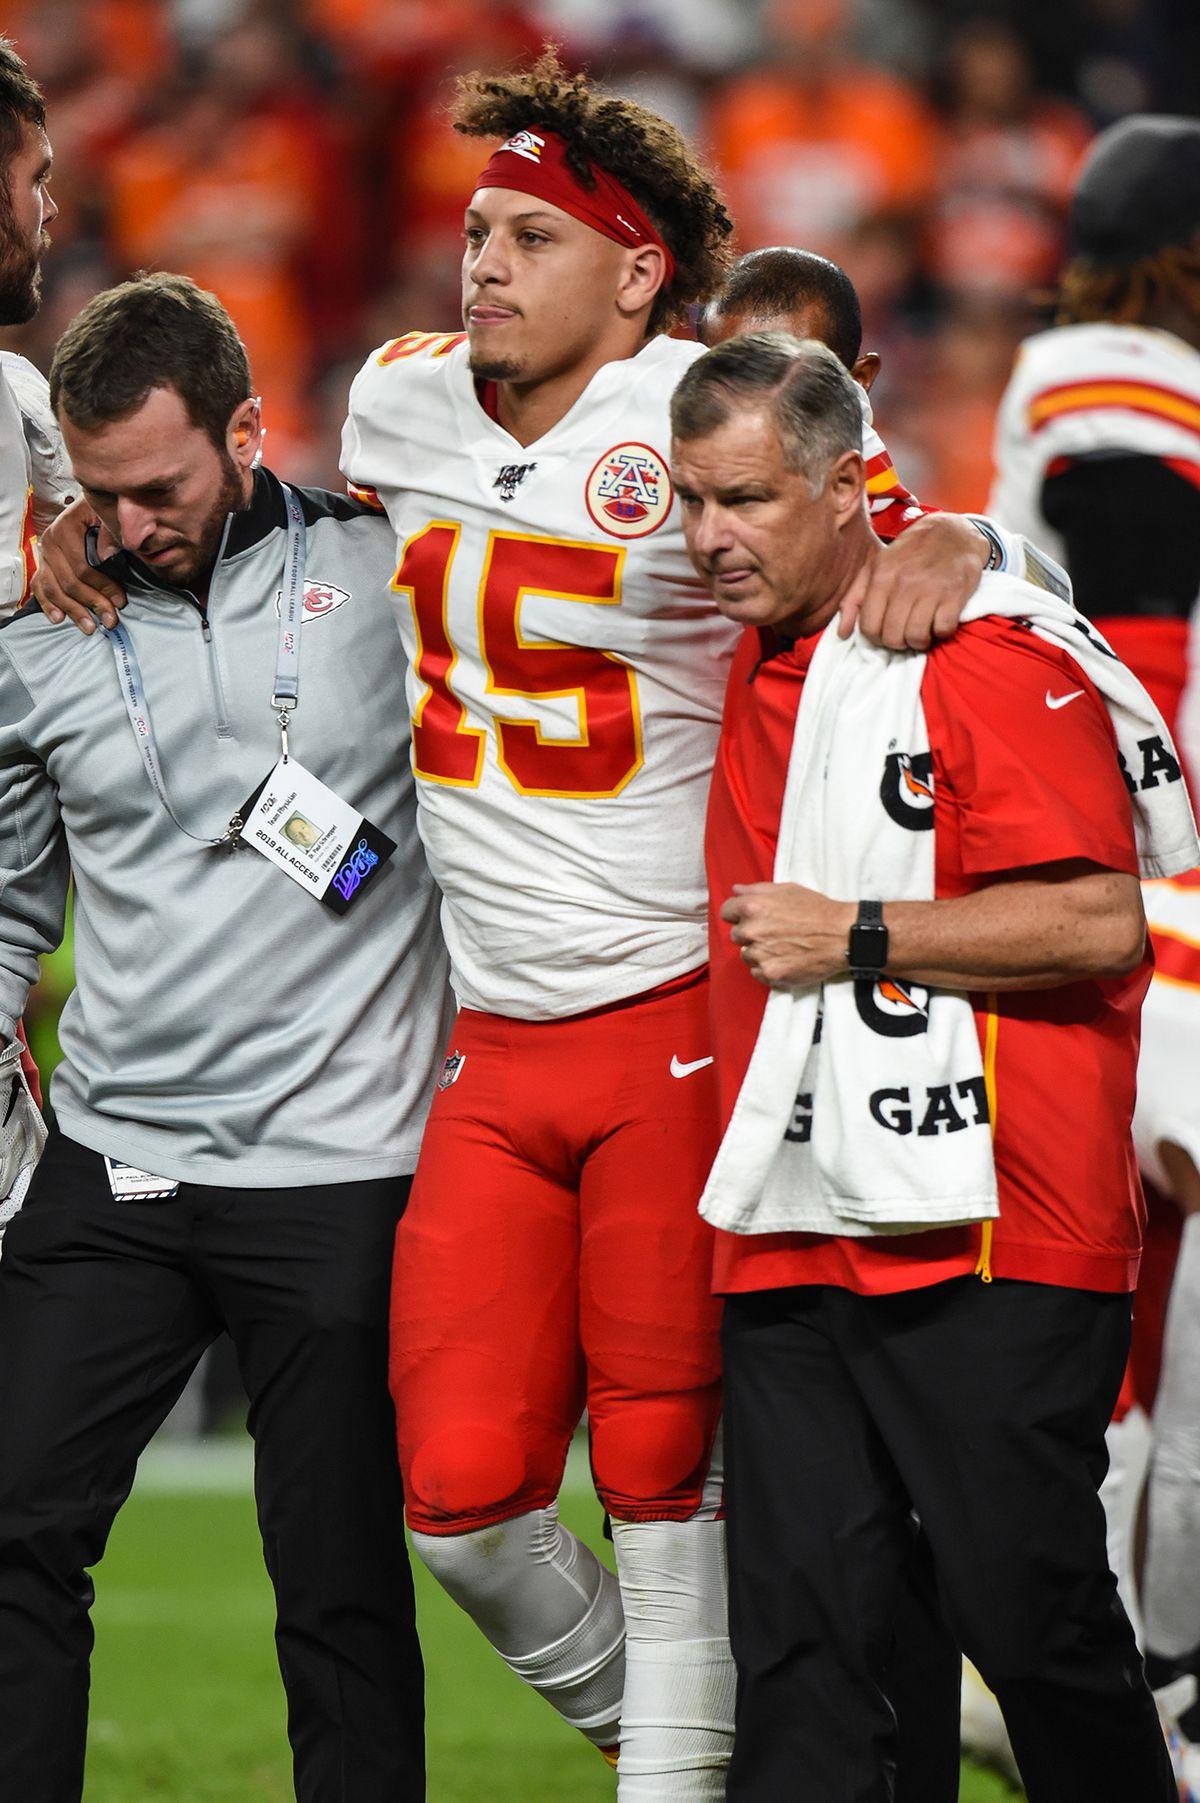 Chiefs provide update on quarterback Patrick Mahomes' injury